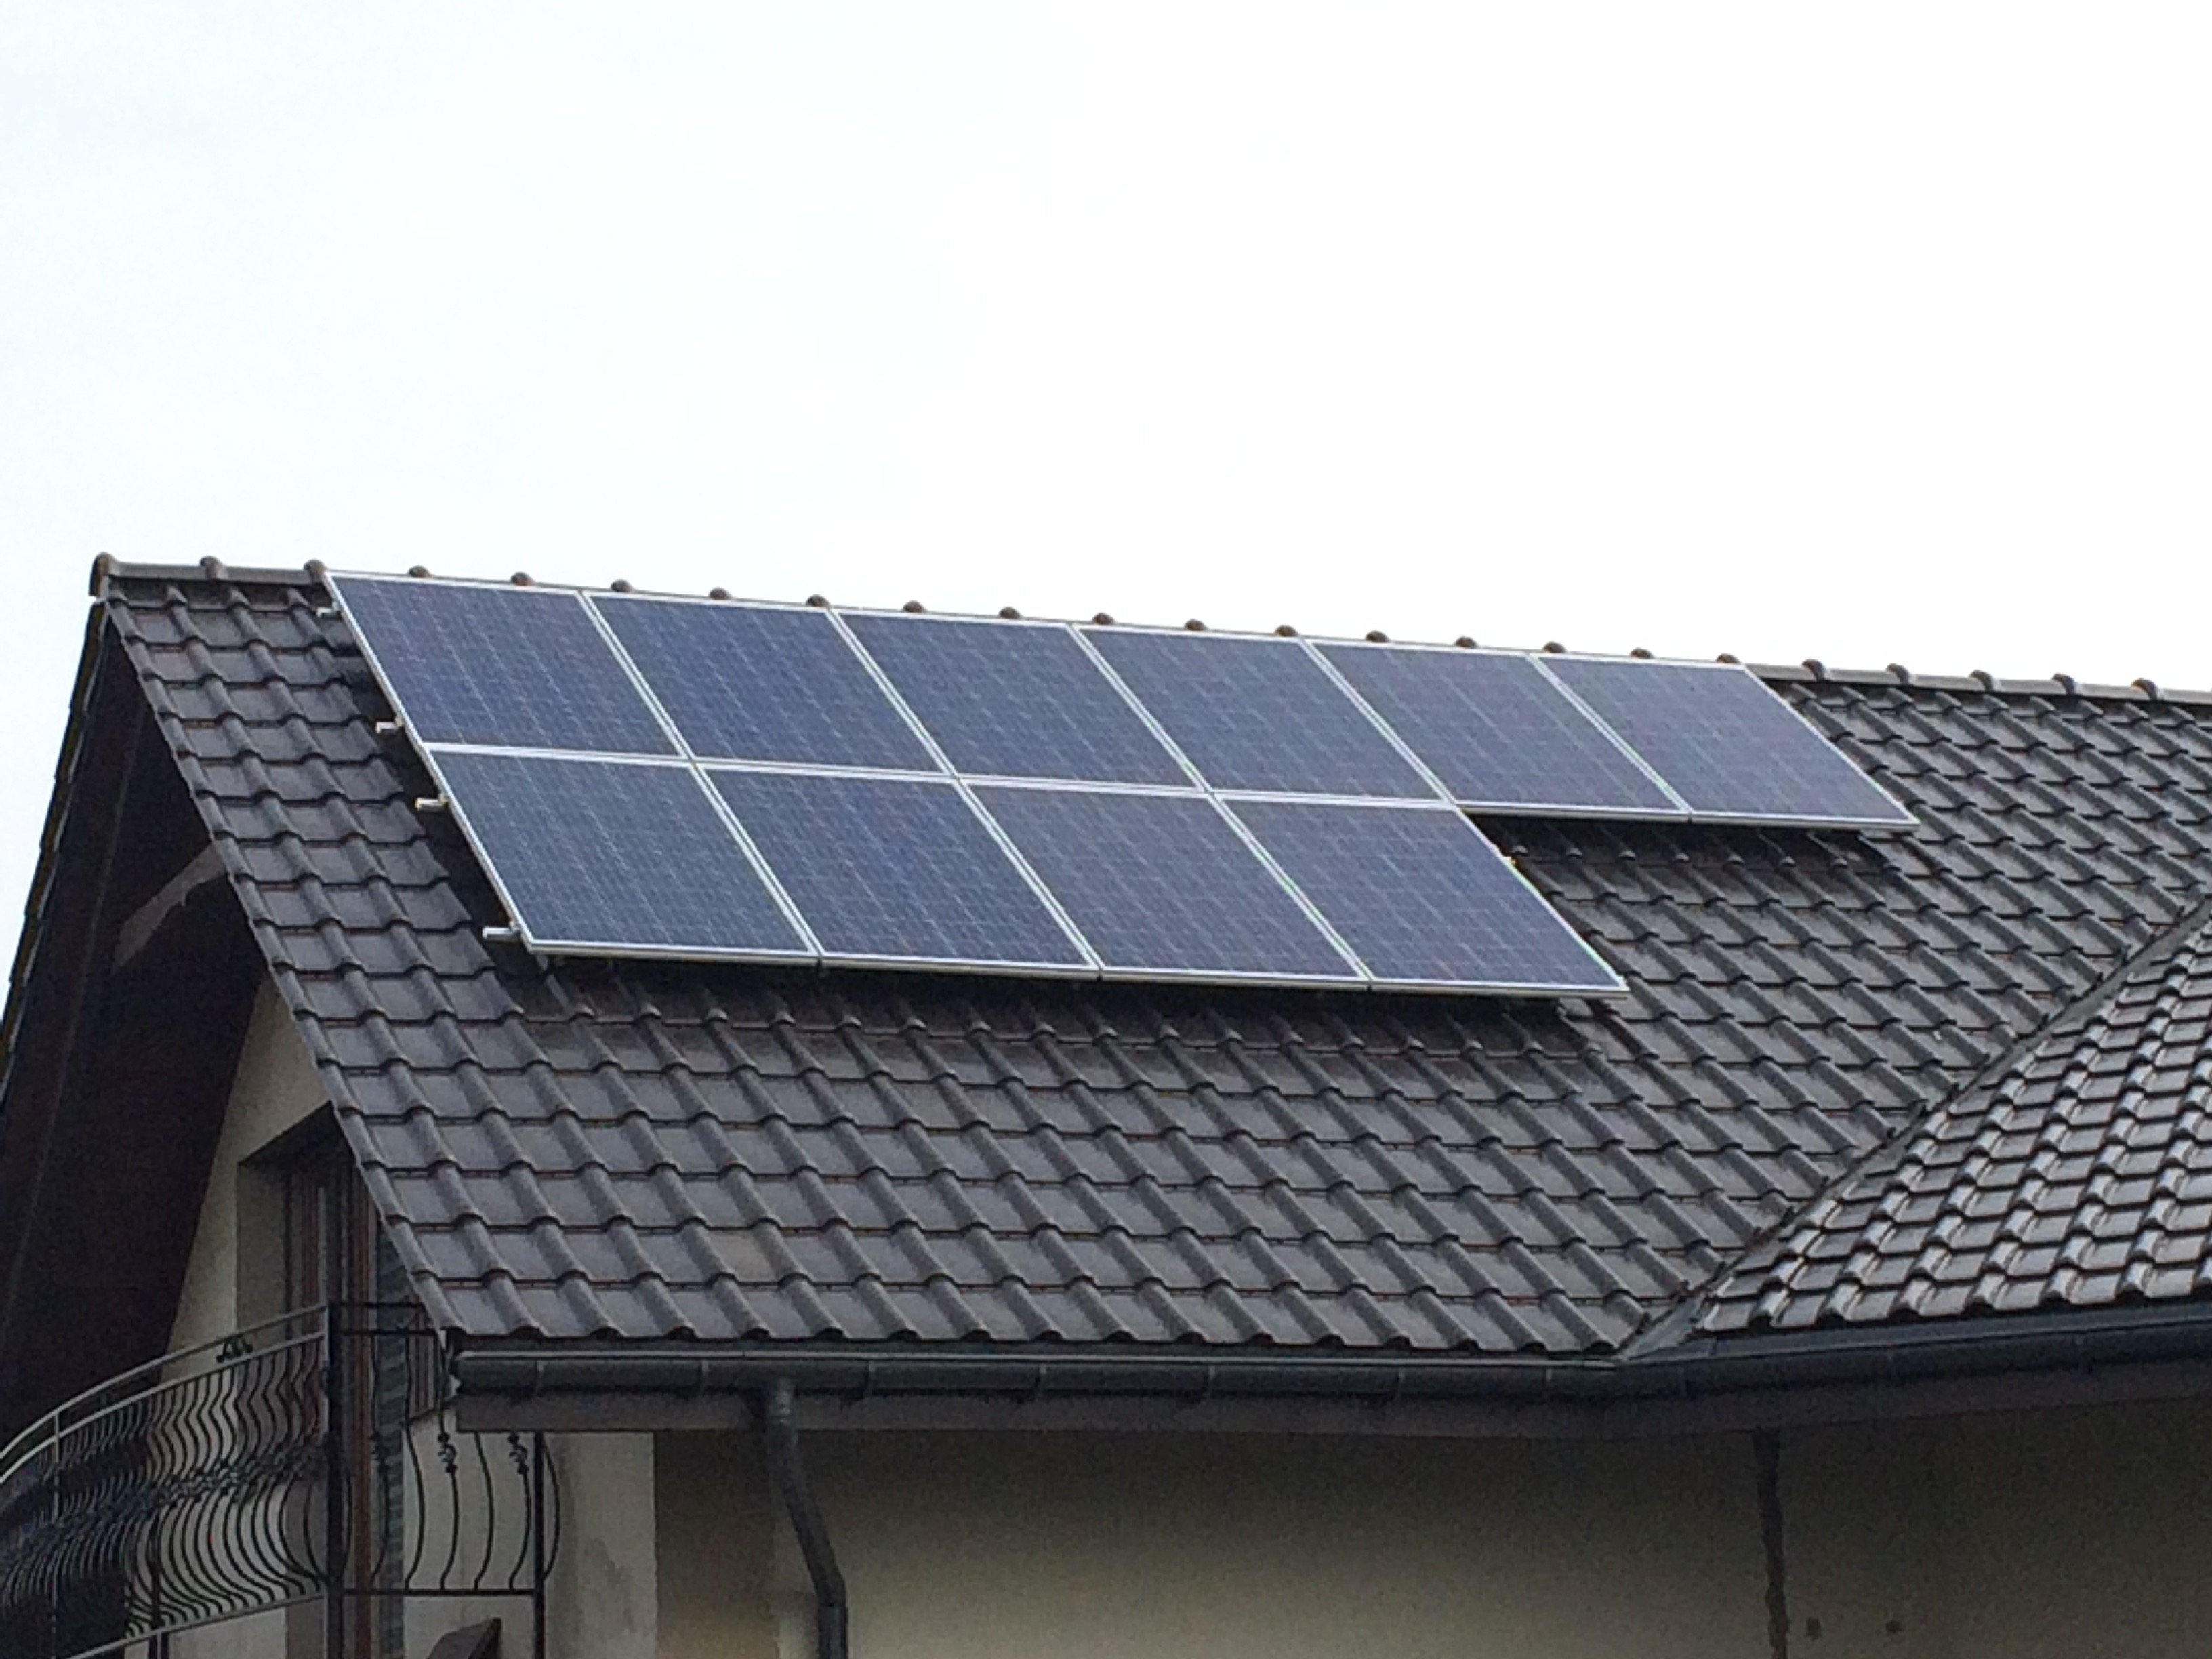 Jastrzębie-Zdrój - Moc 2,6 kWp On-grid